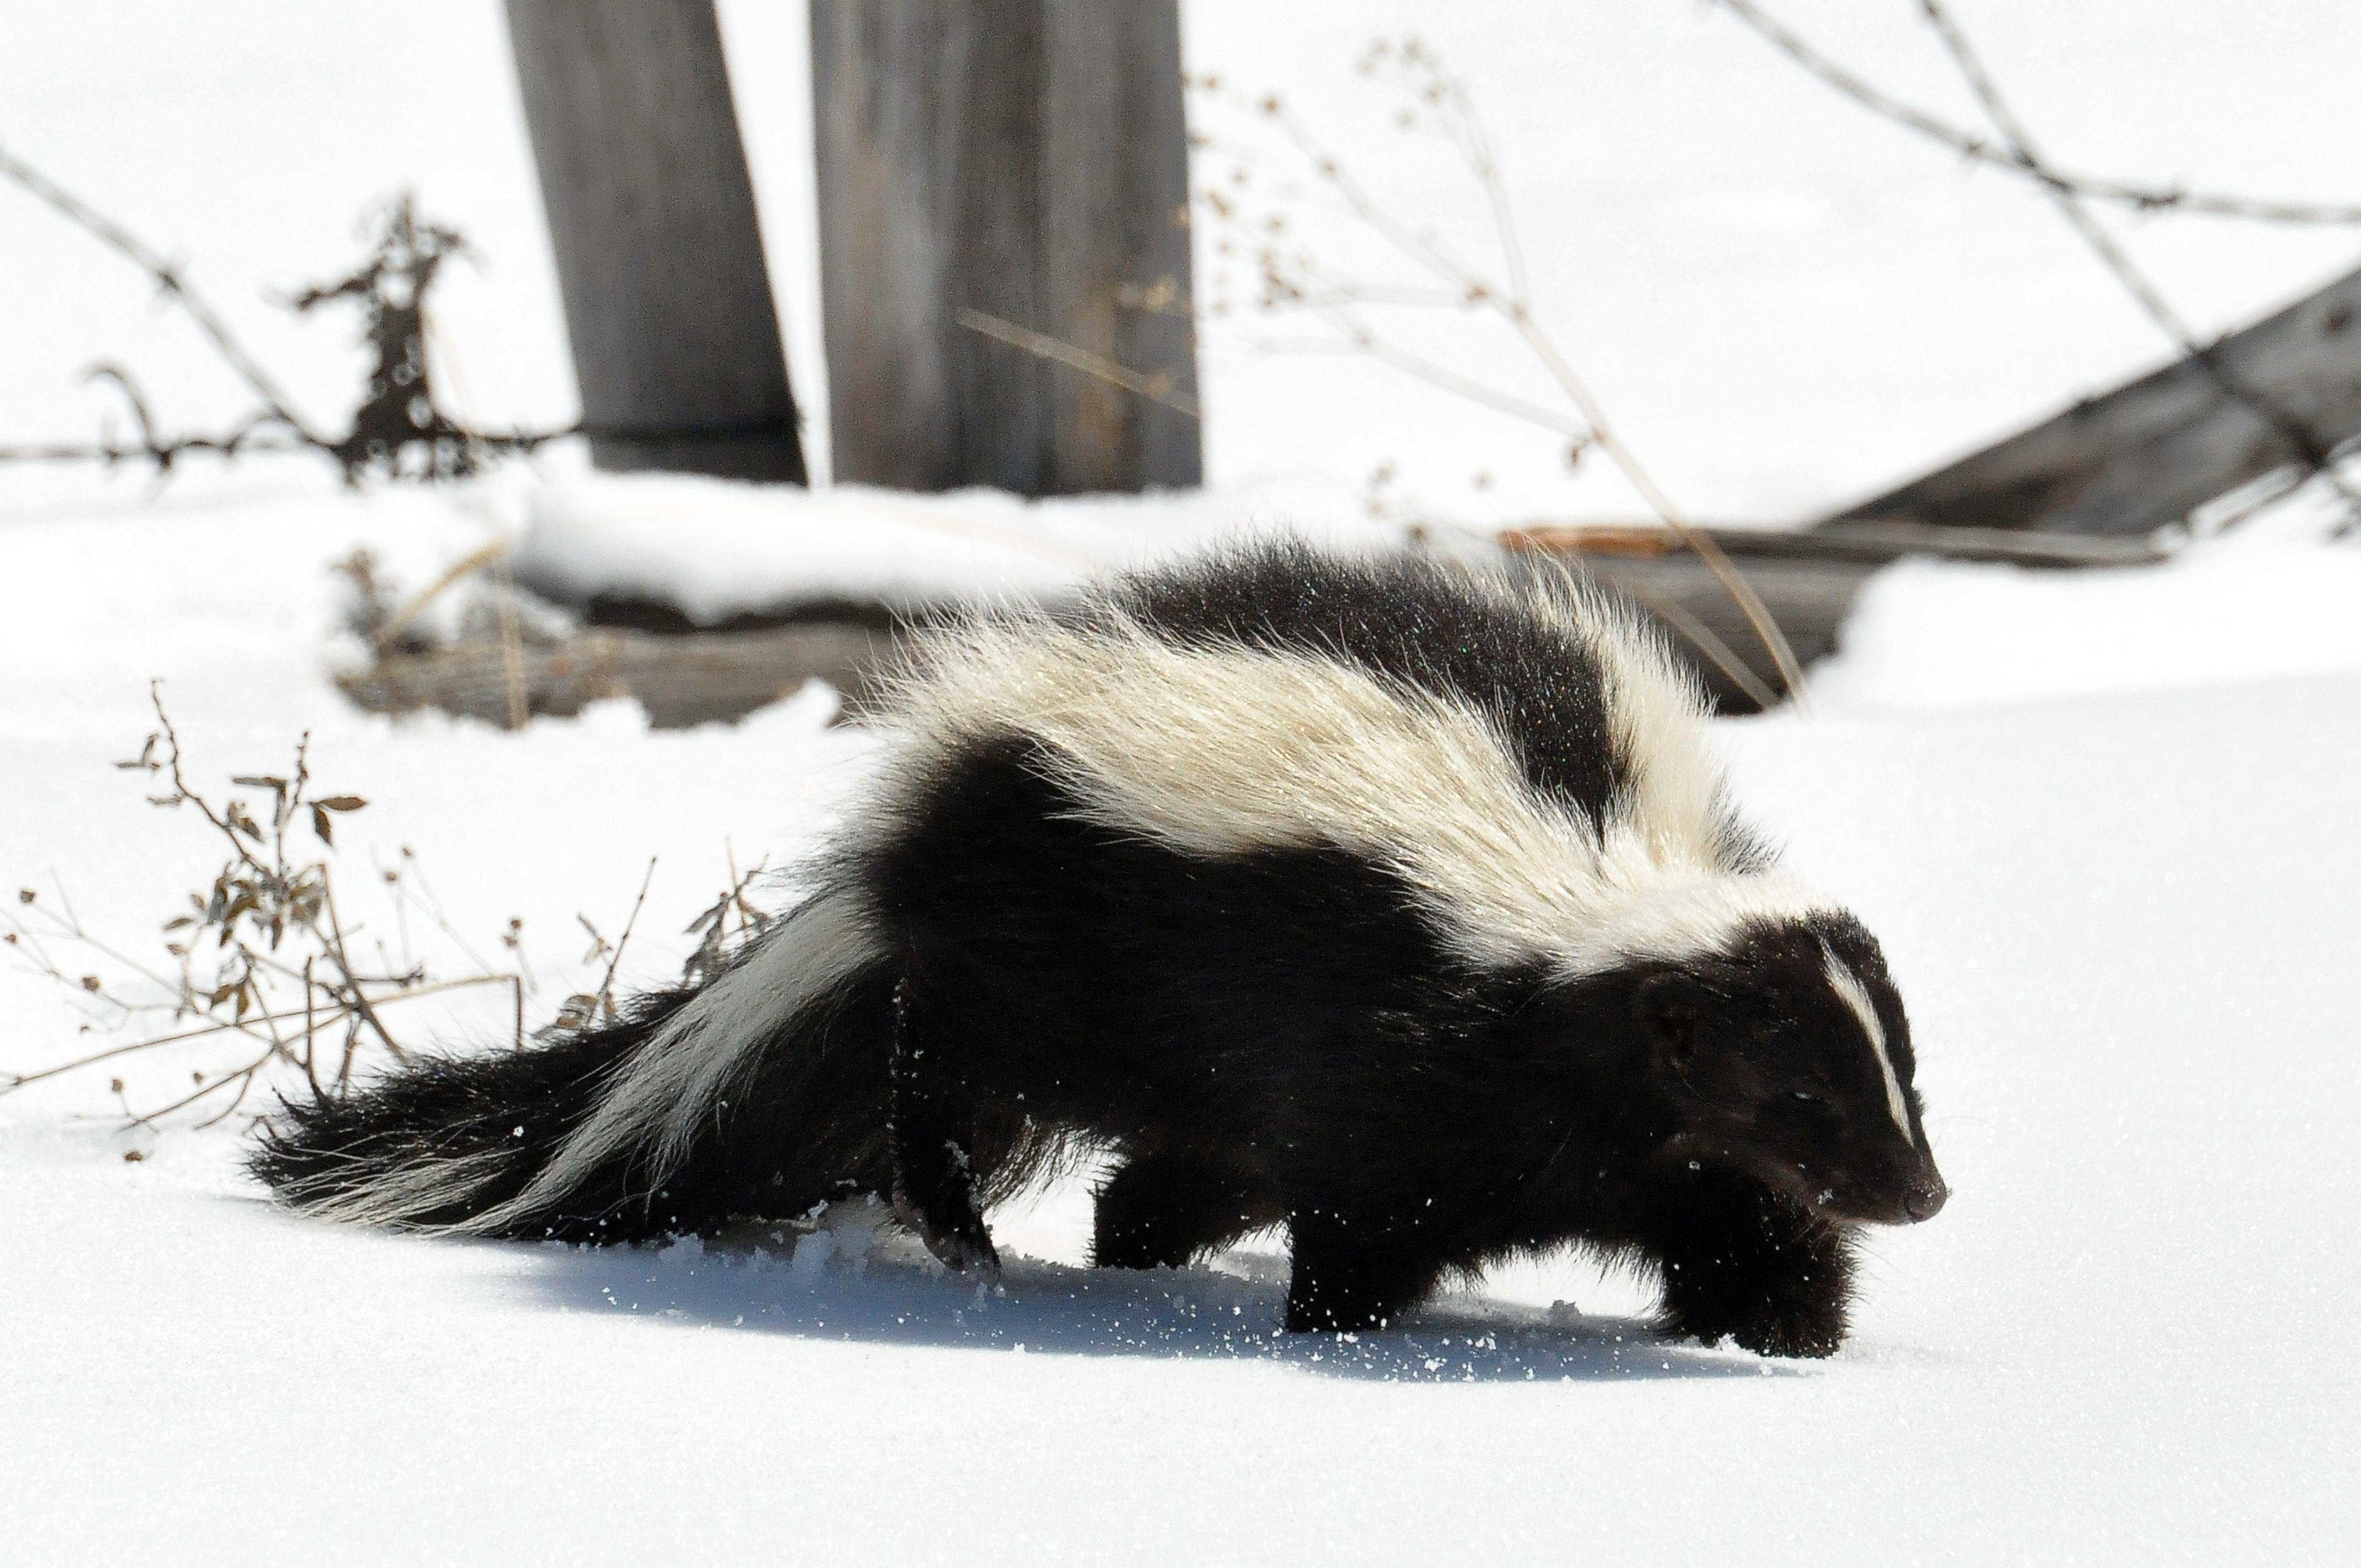 striped skunk wikipedia  striped skunk